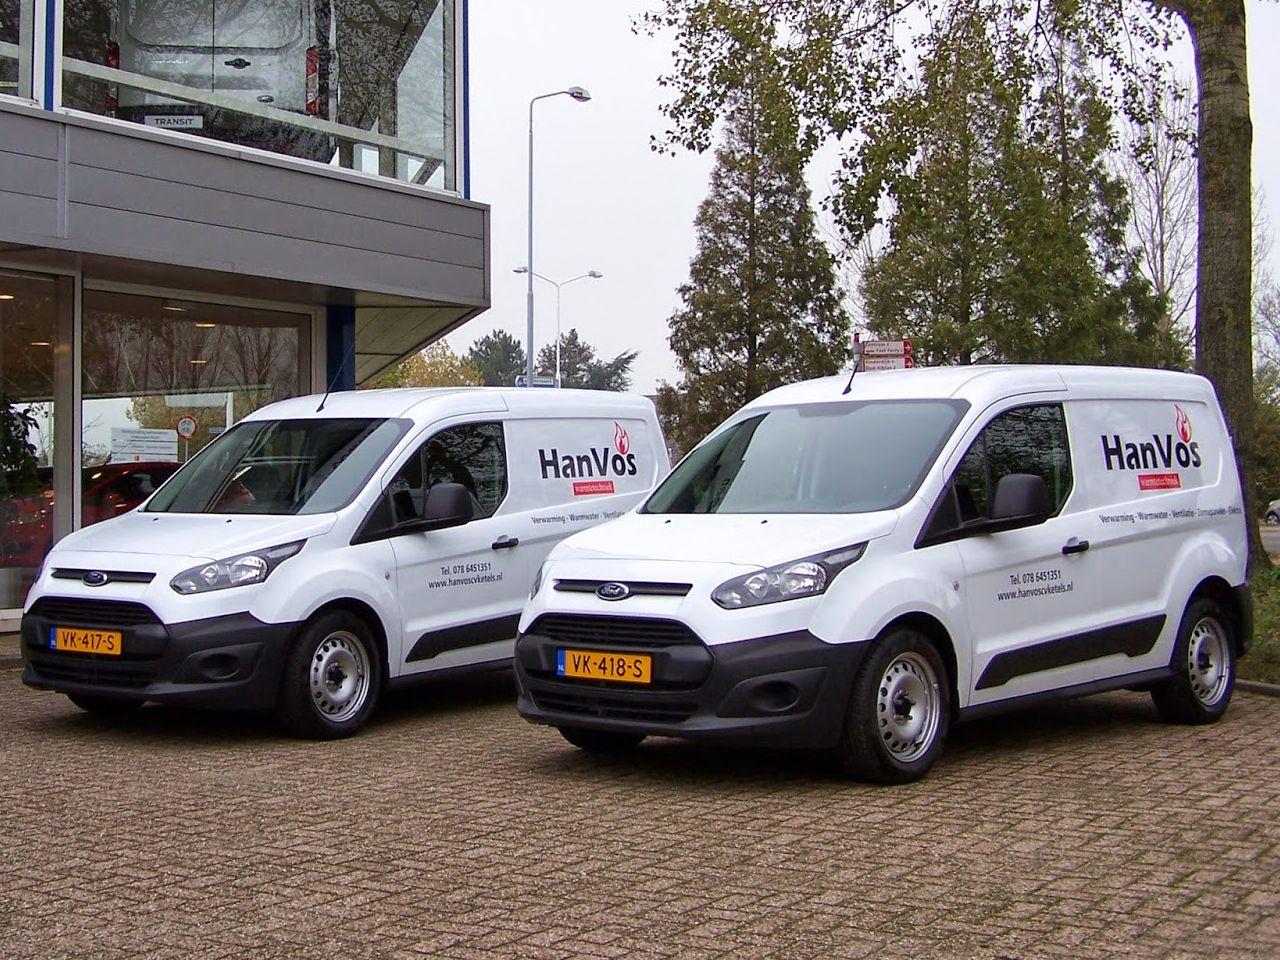 Onderhoud CV bedrijf HanVos Warmtetechniek CV ketels Zoetermeer in